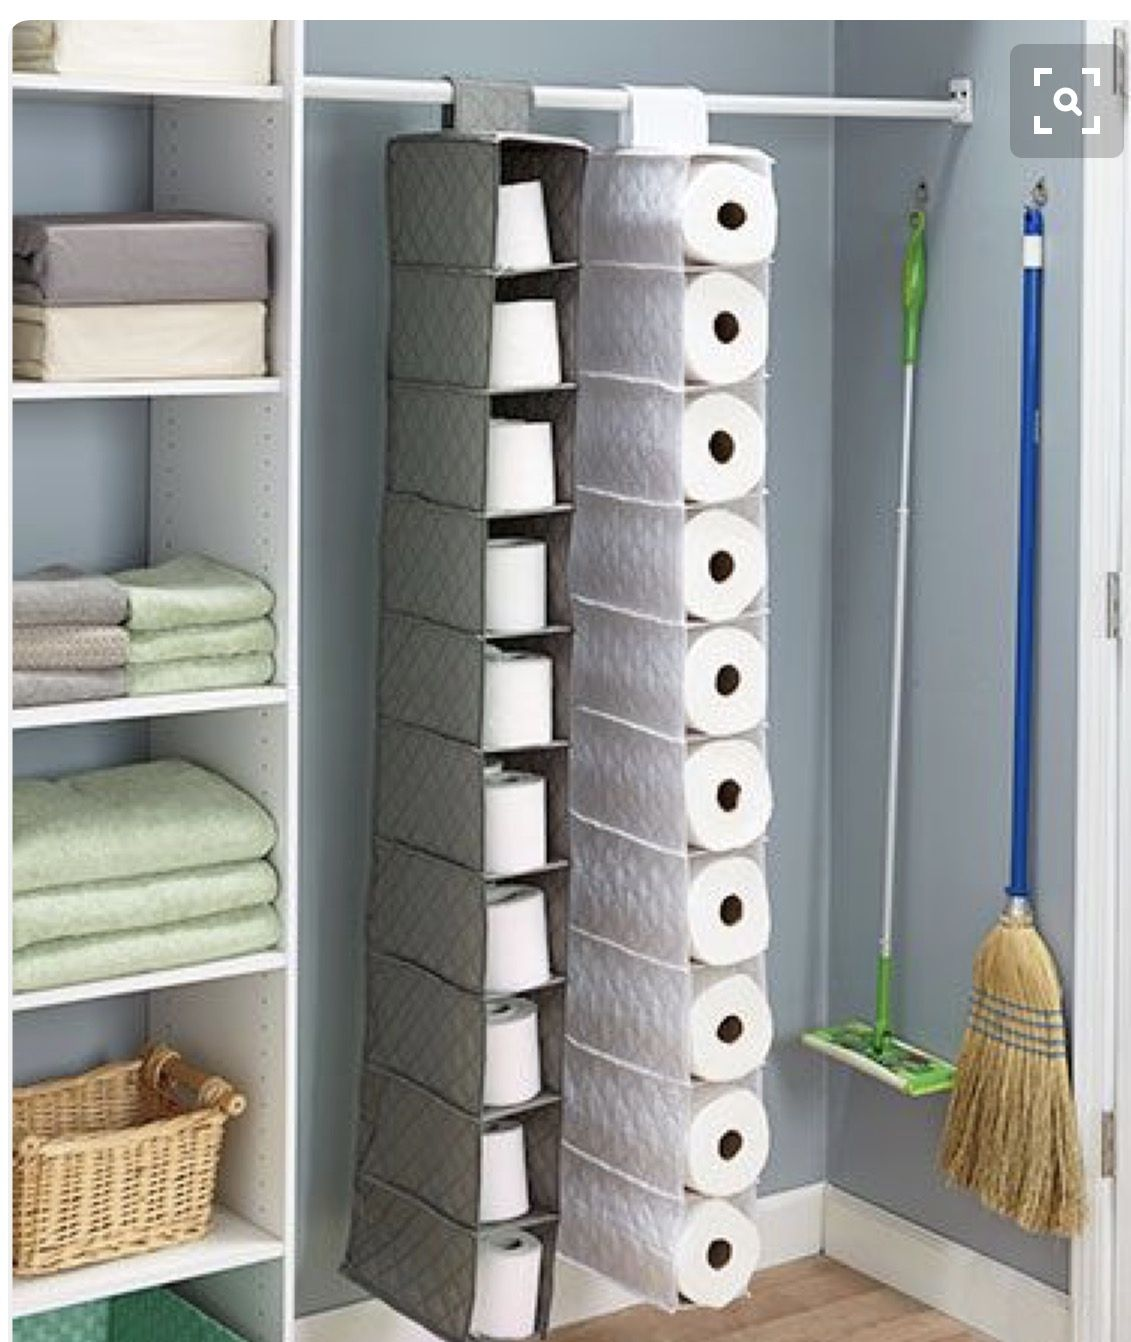 Bulk Paper Towel Or Tp Storage Idea